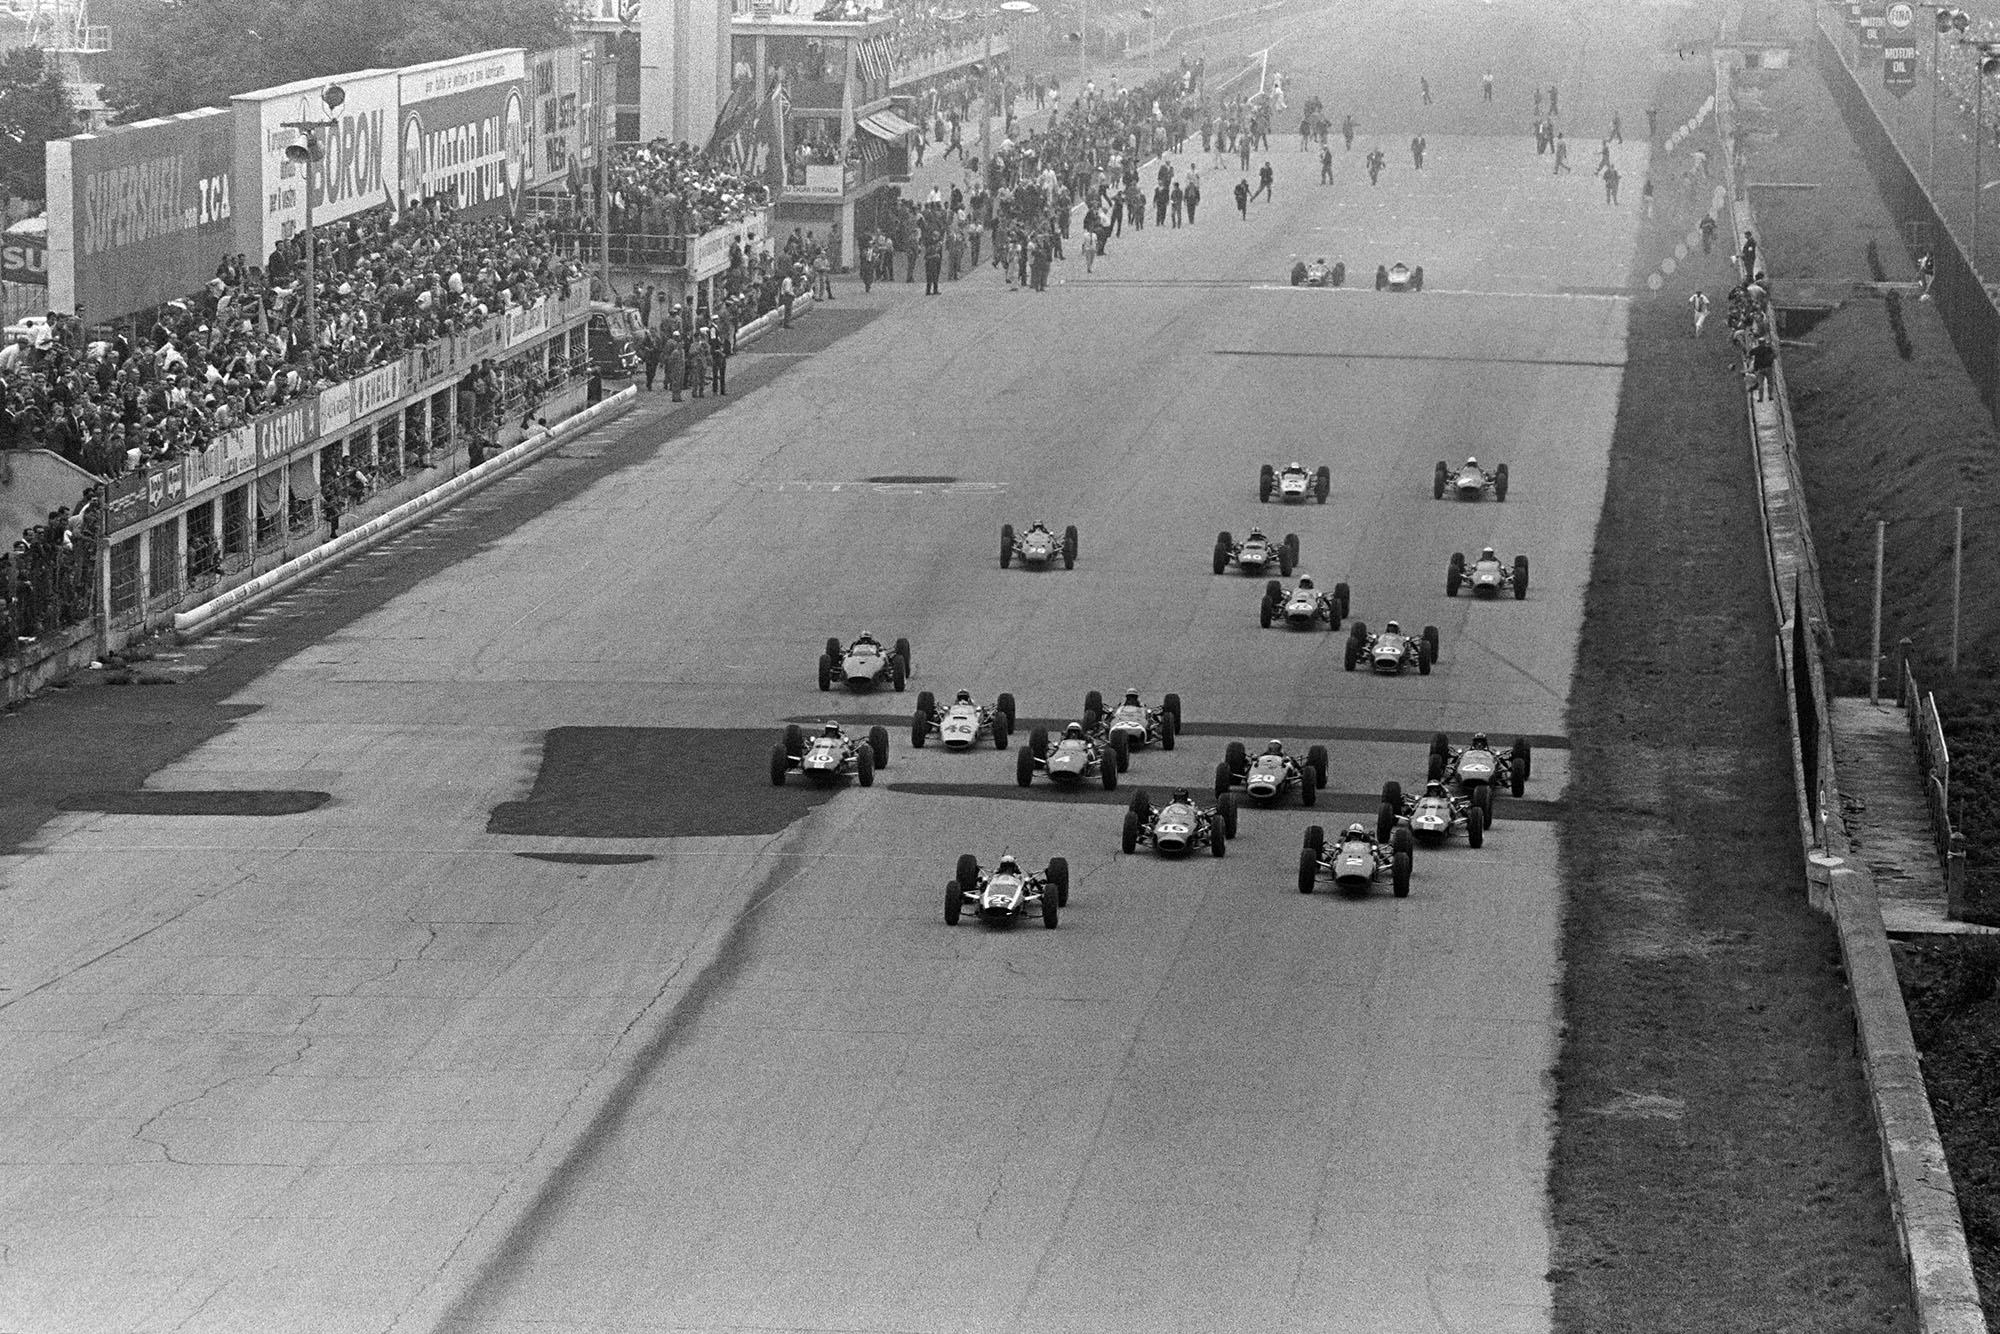 The start of the race. Bruce McLaren, Cooper T73 Climax, John Surtees, Ferrari 158, and Dan Gurney, Brabham BT7 Climax, do battle at the front.